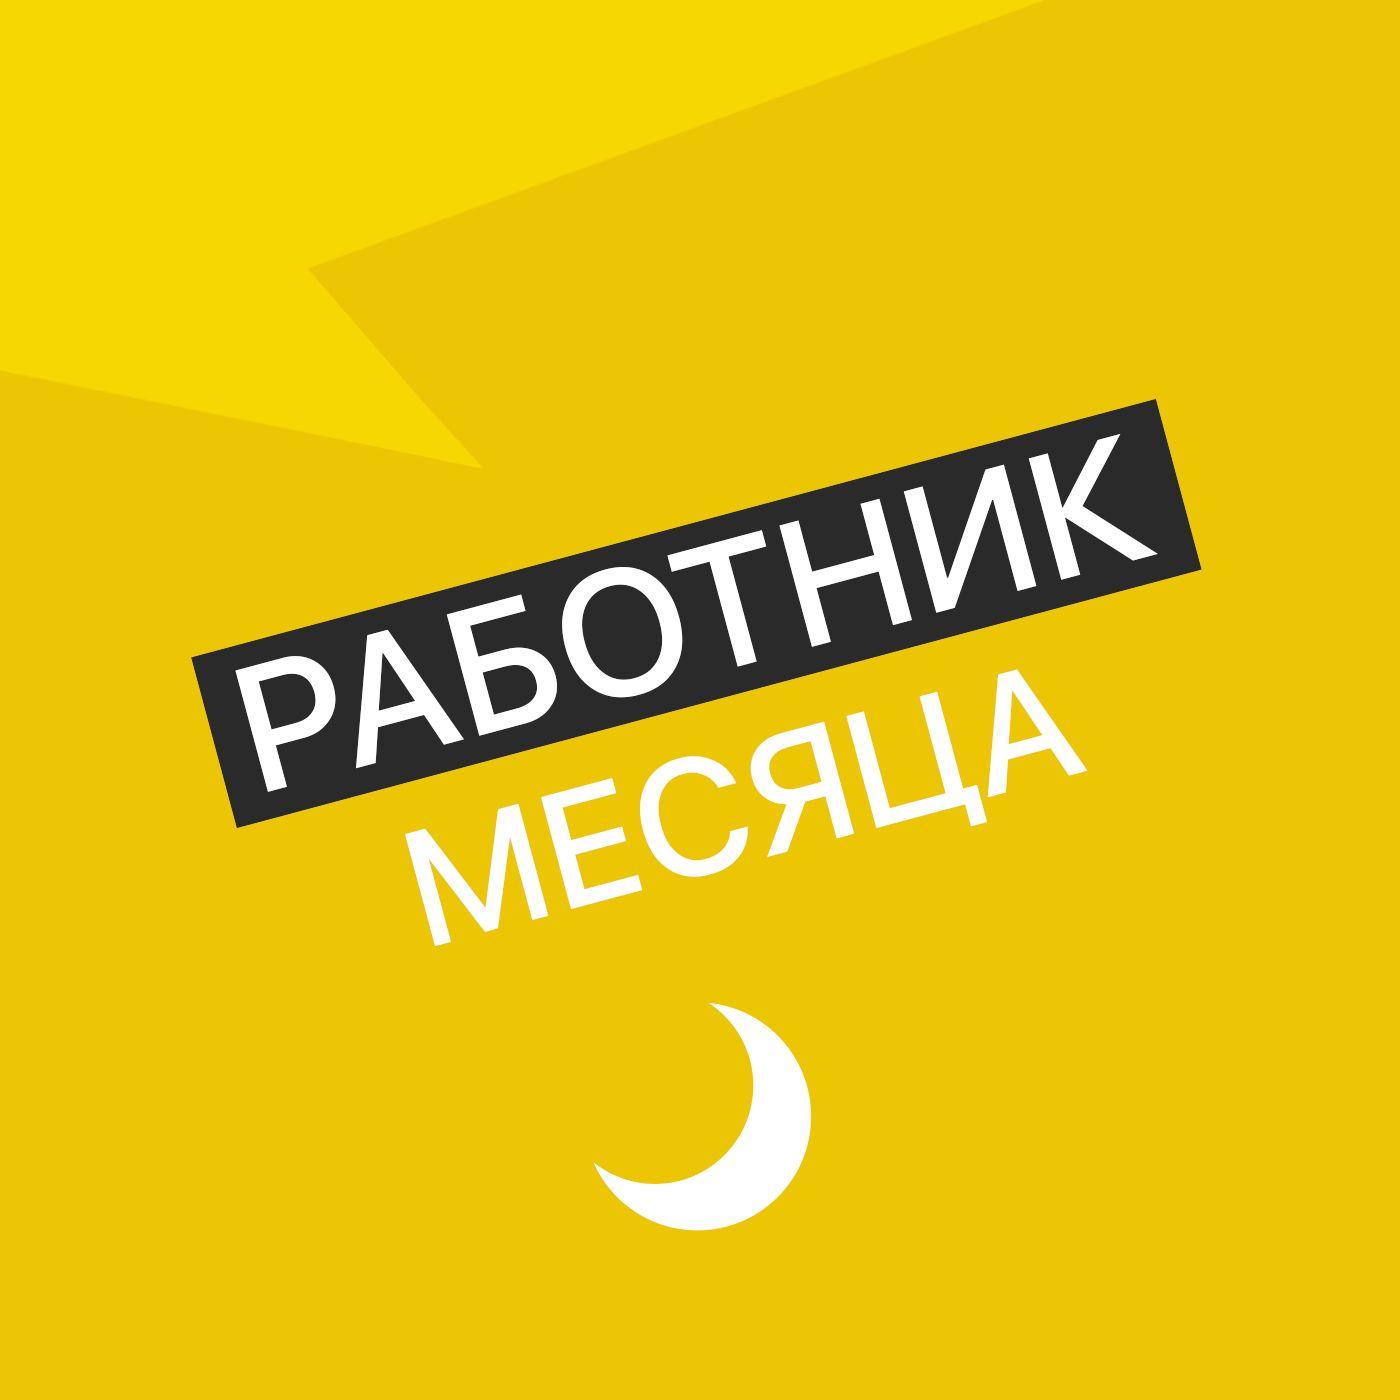 Творческий коллектив Mojomedia HR-специалист творческий коллектив mojomedia барбер